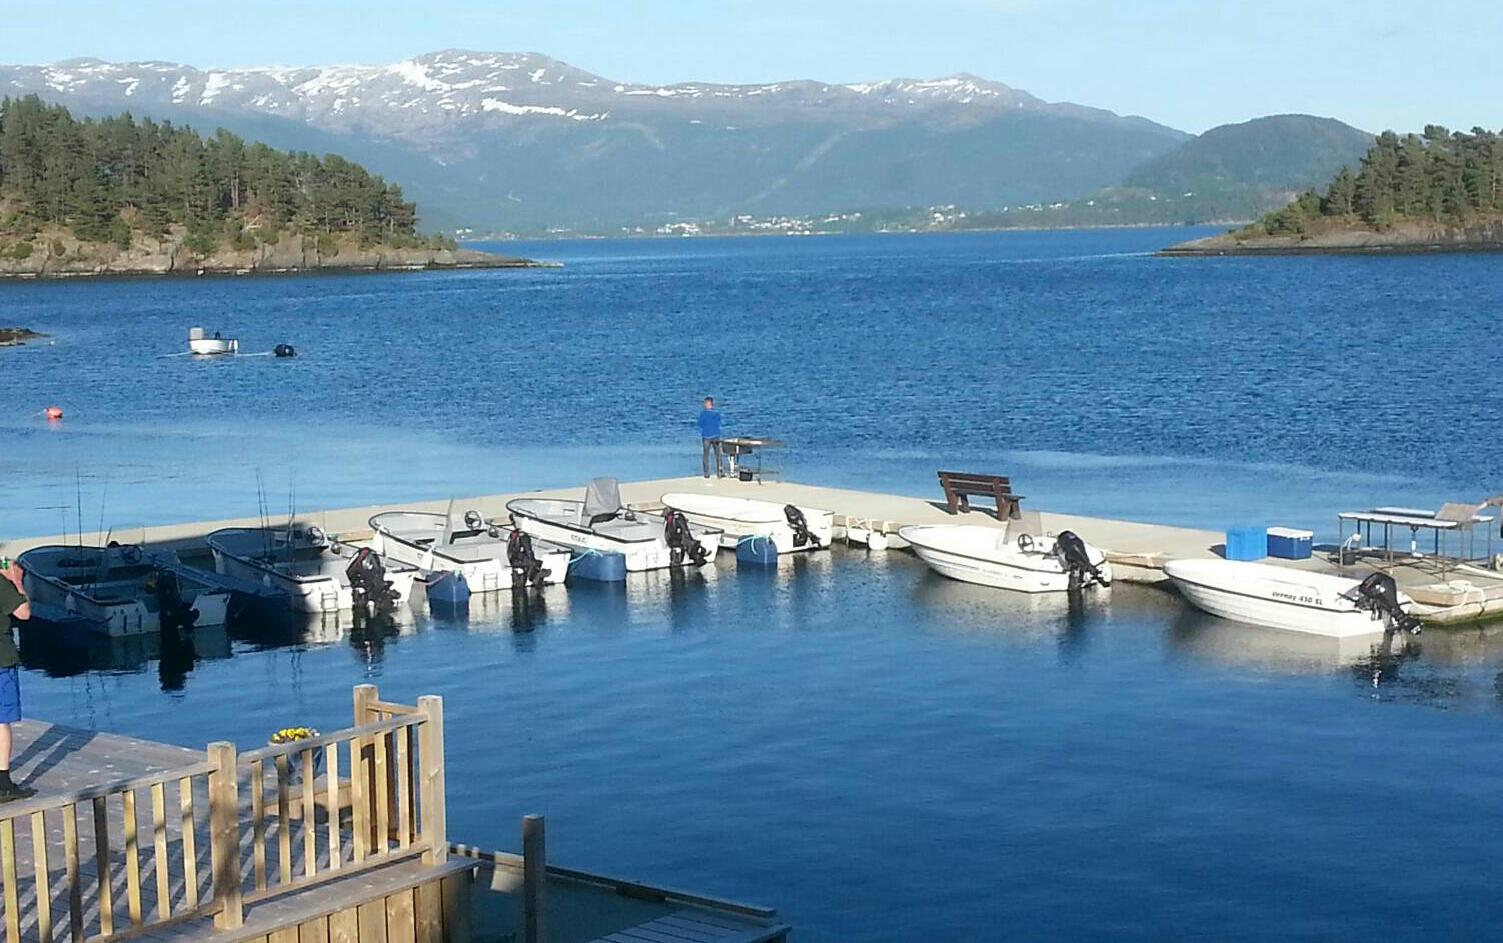 Flytebrygge - floating dock